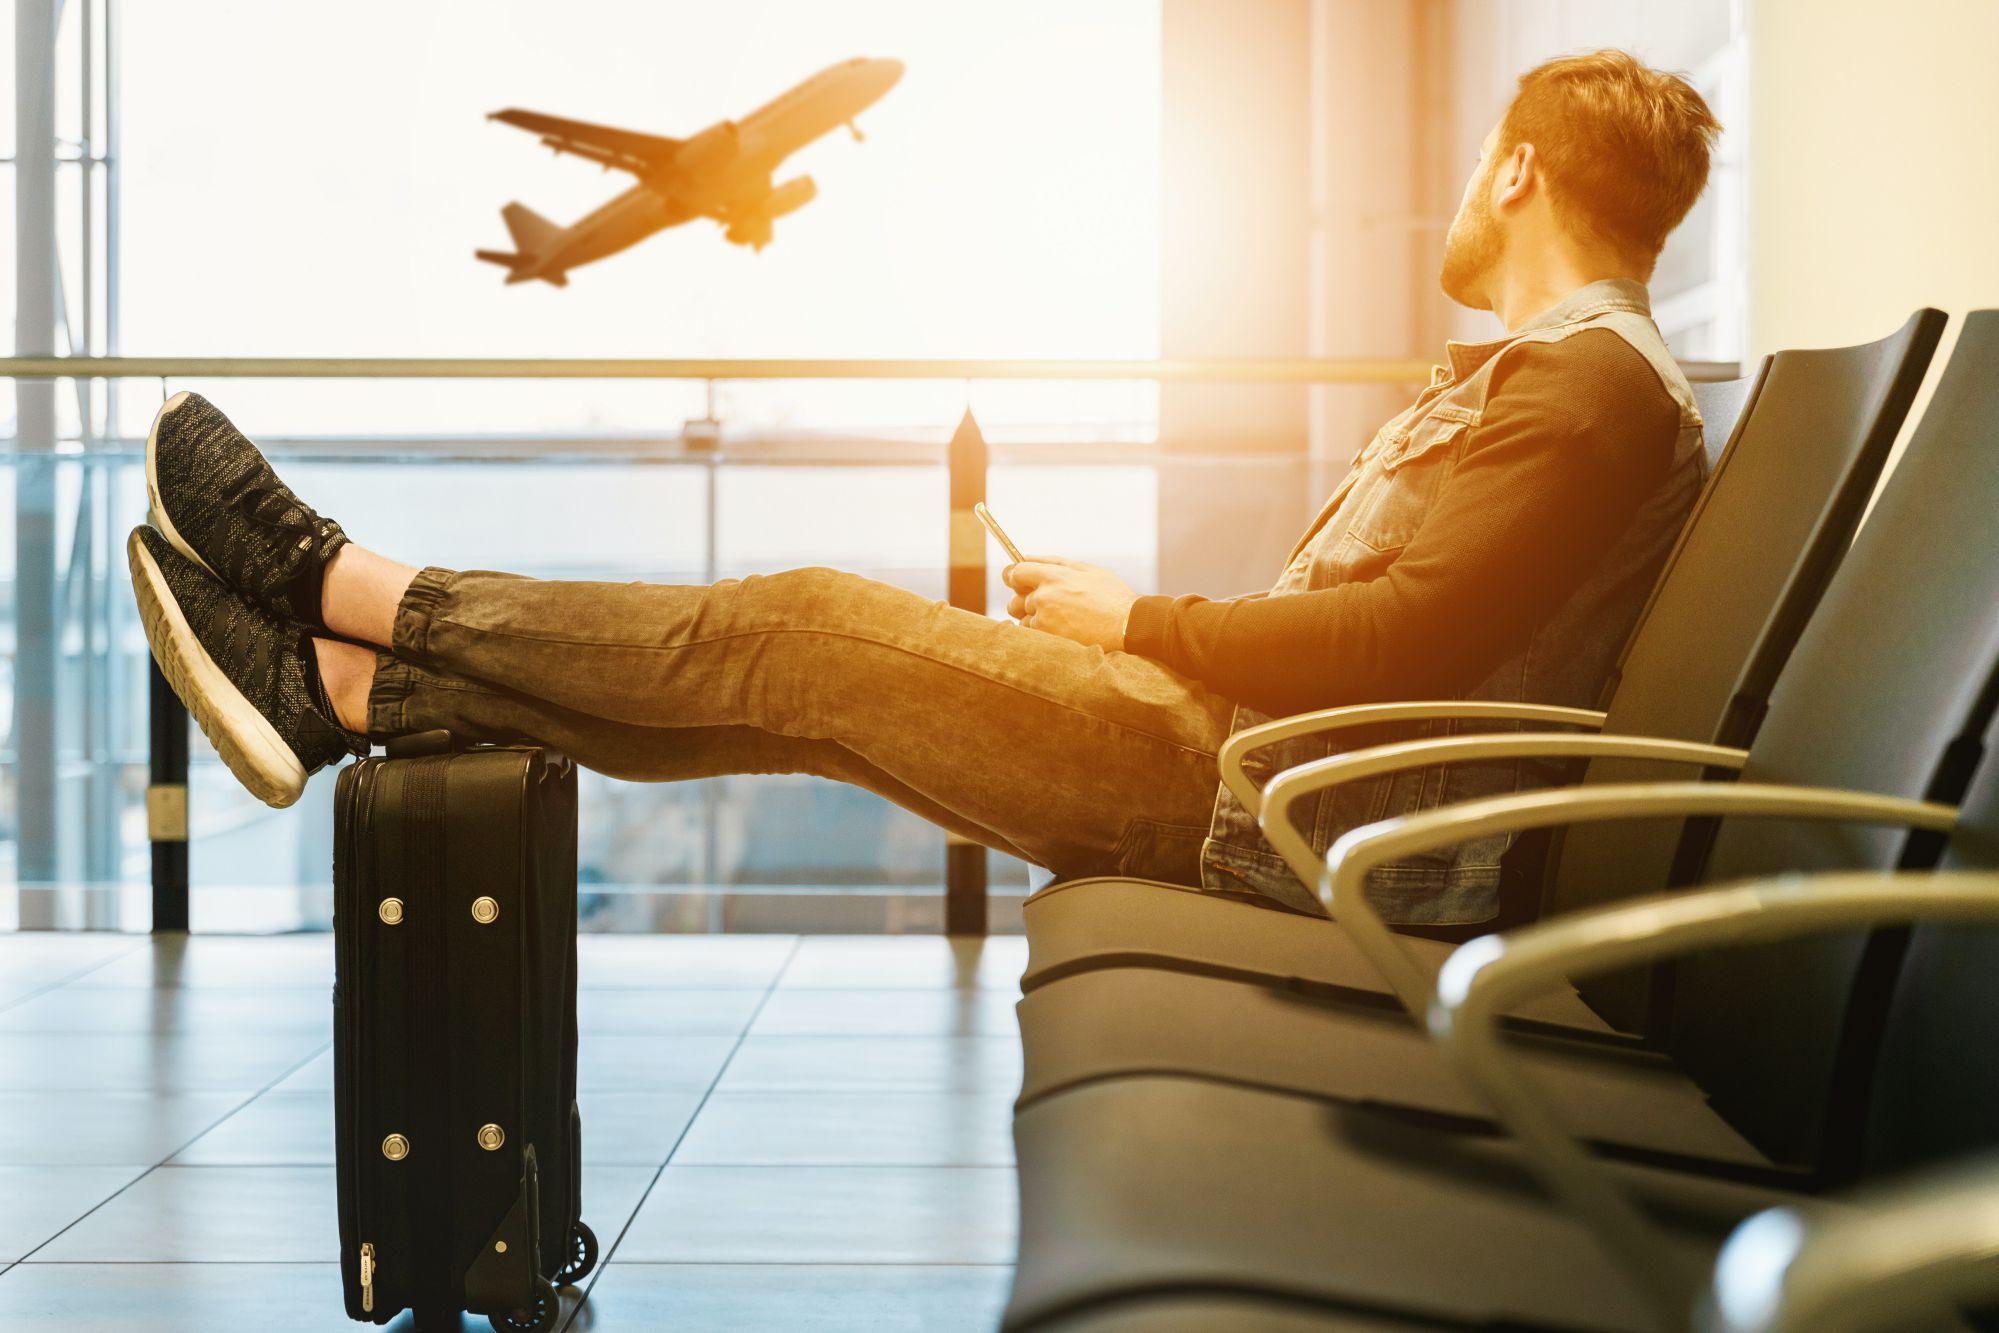 buy a travel insurance